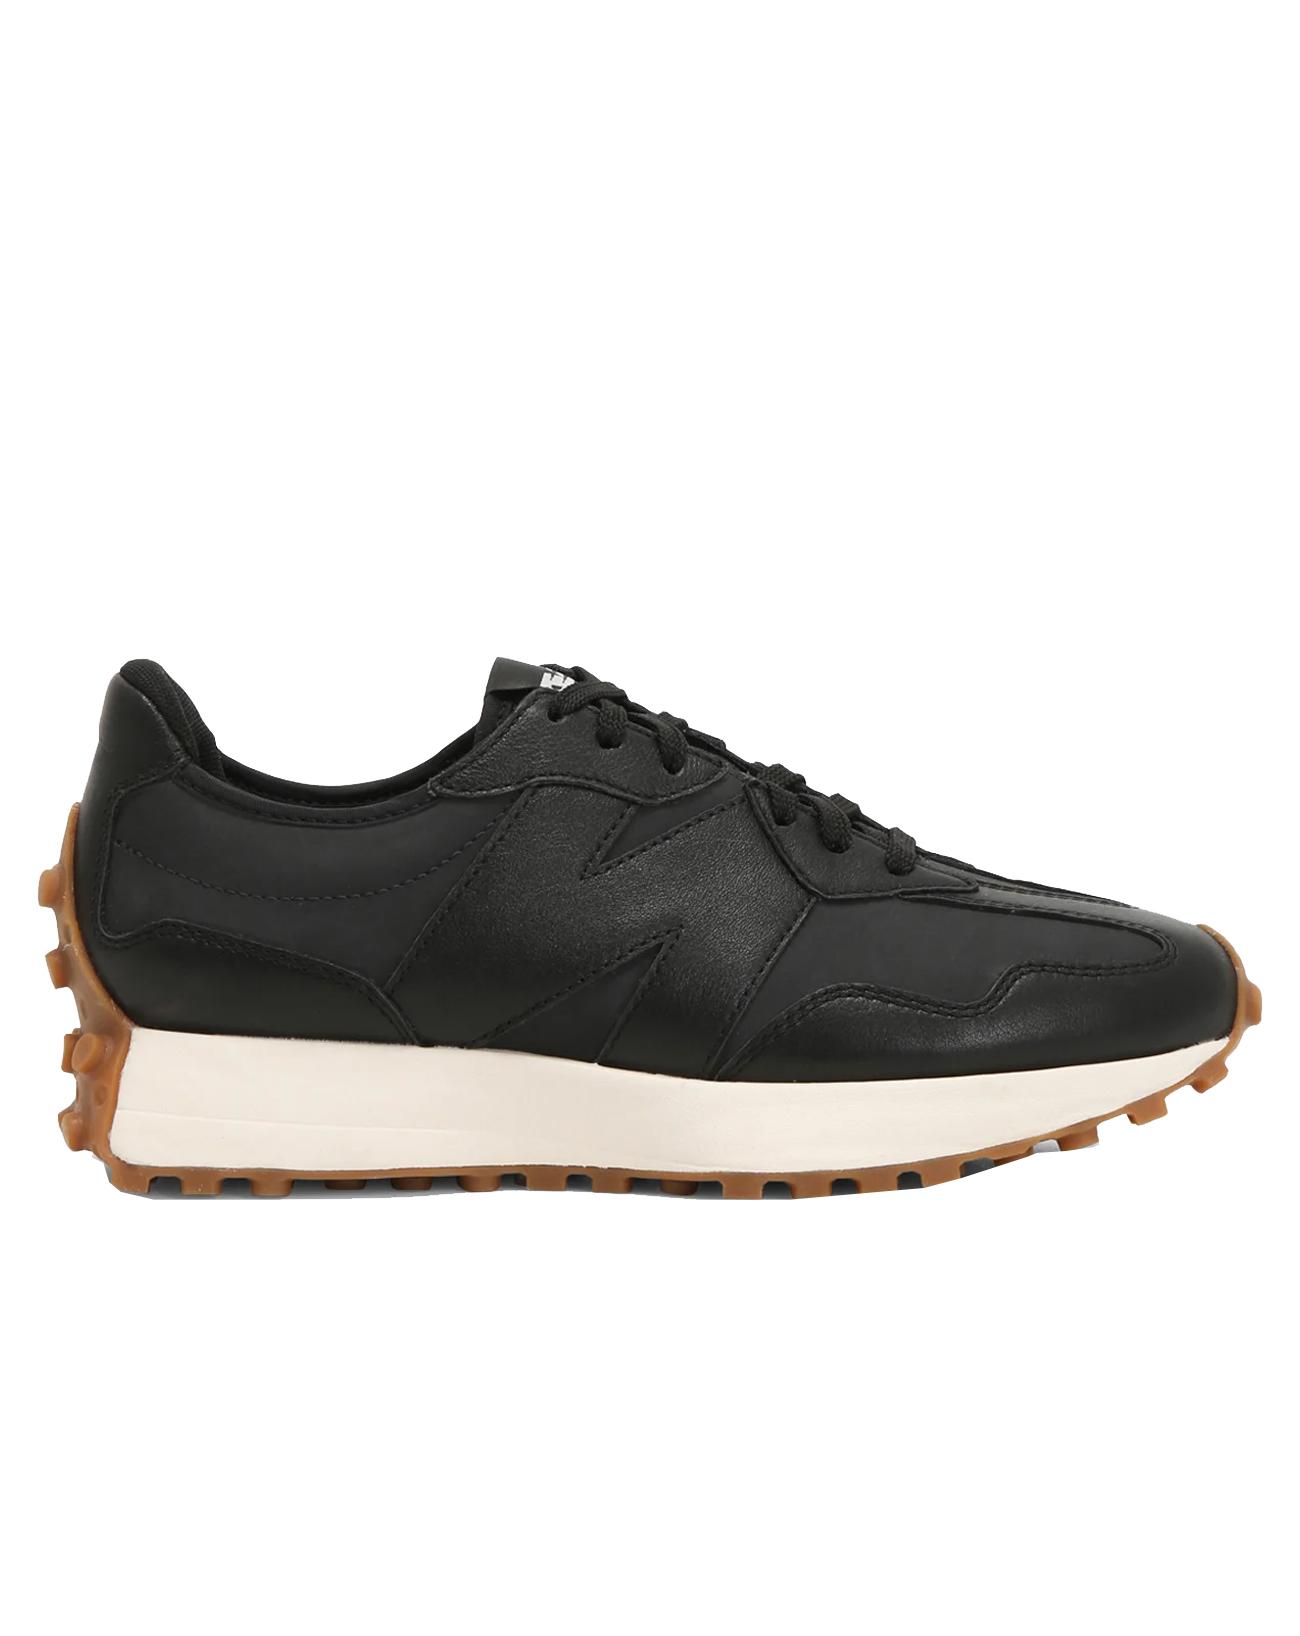 new balance 327 black leather